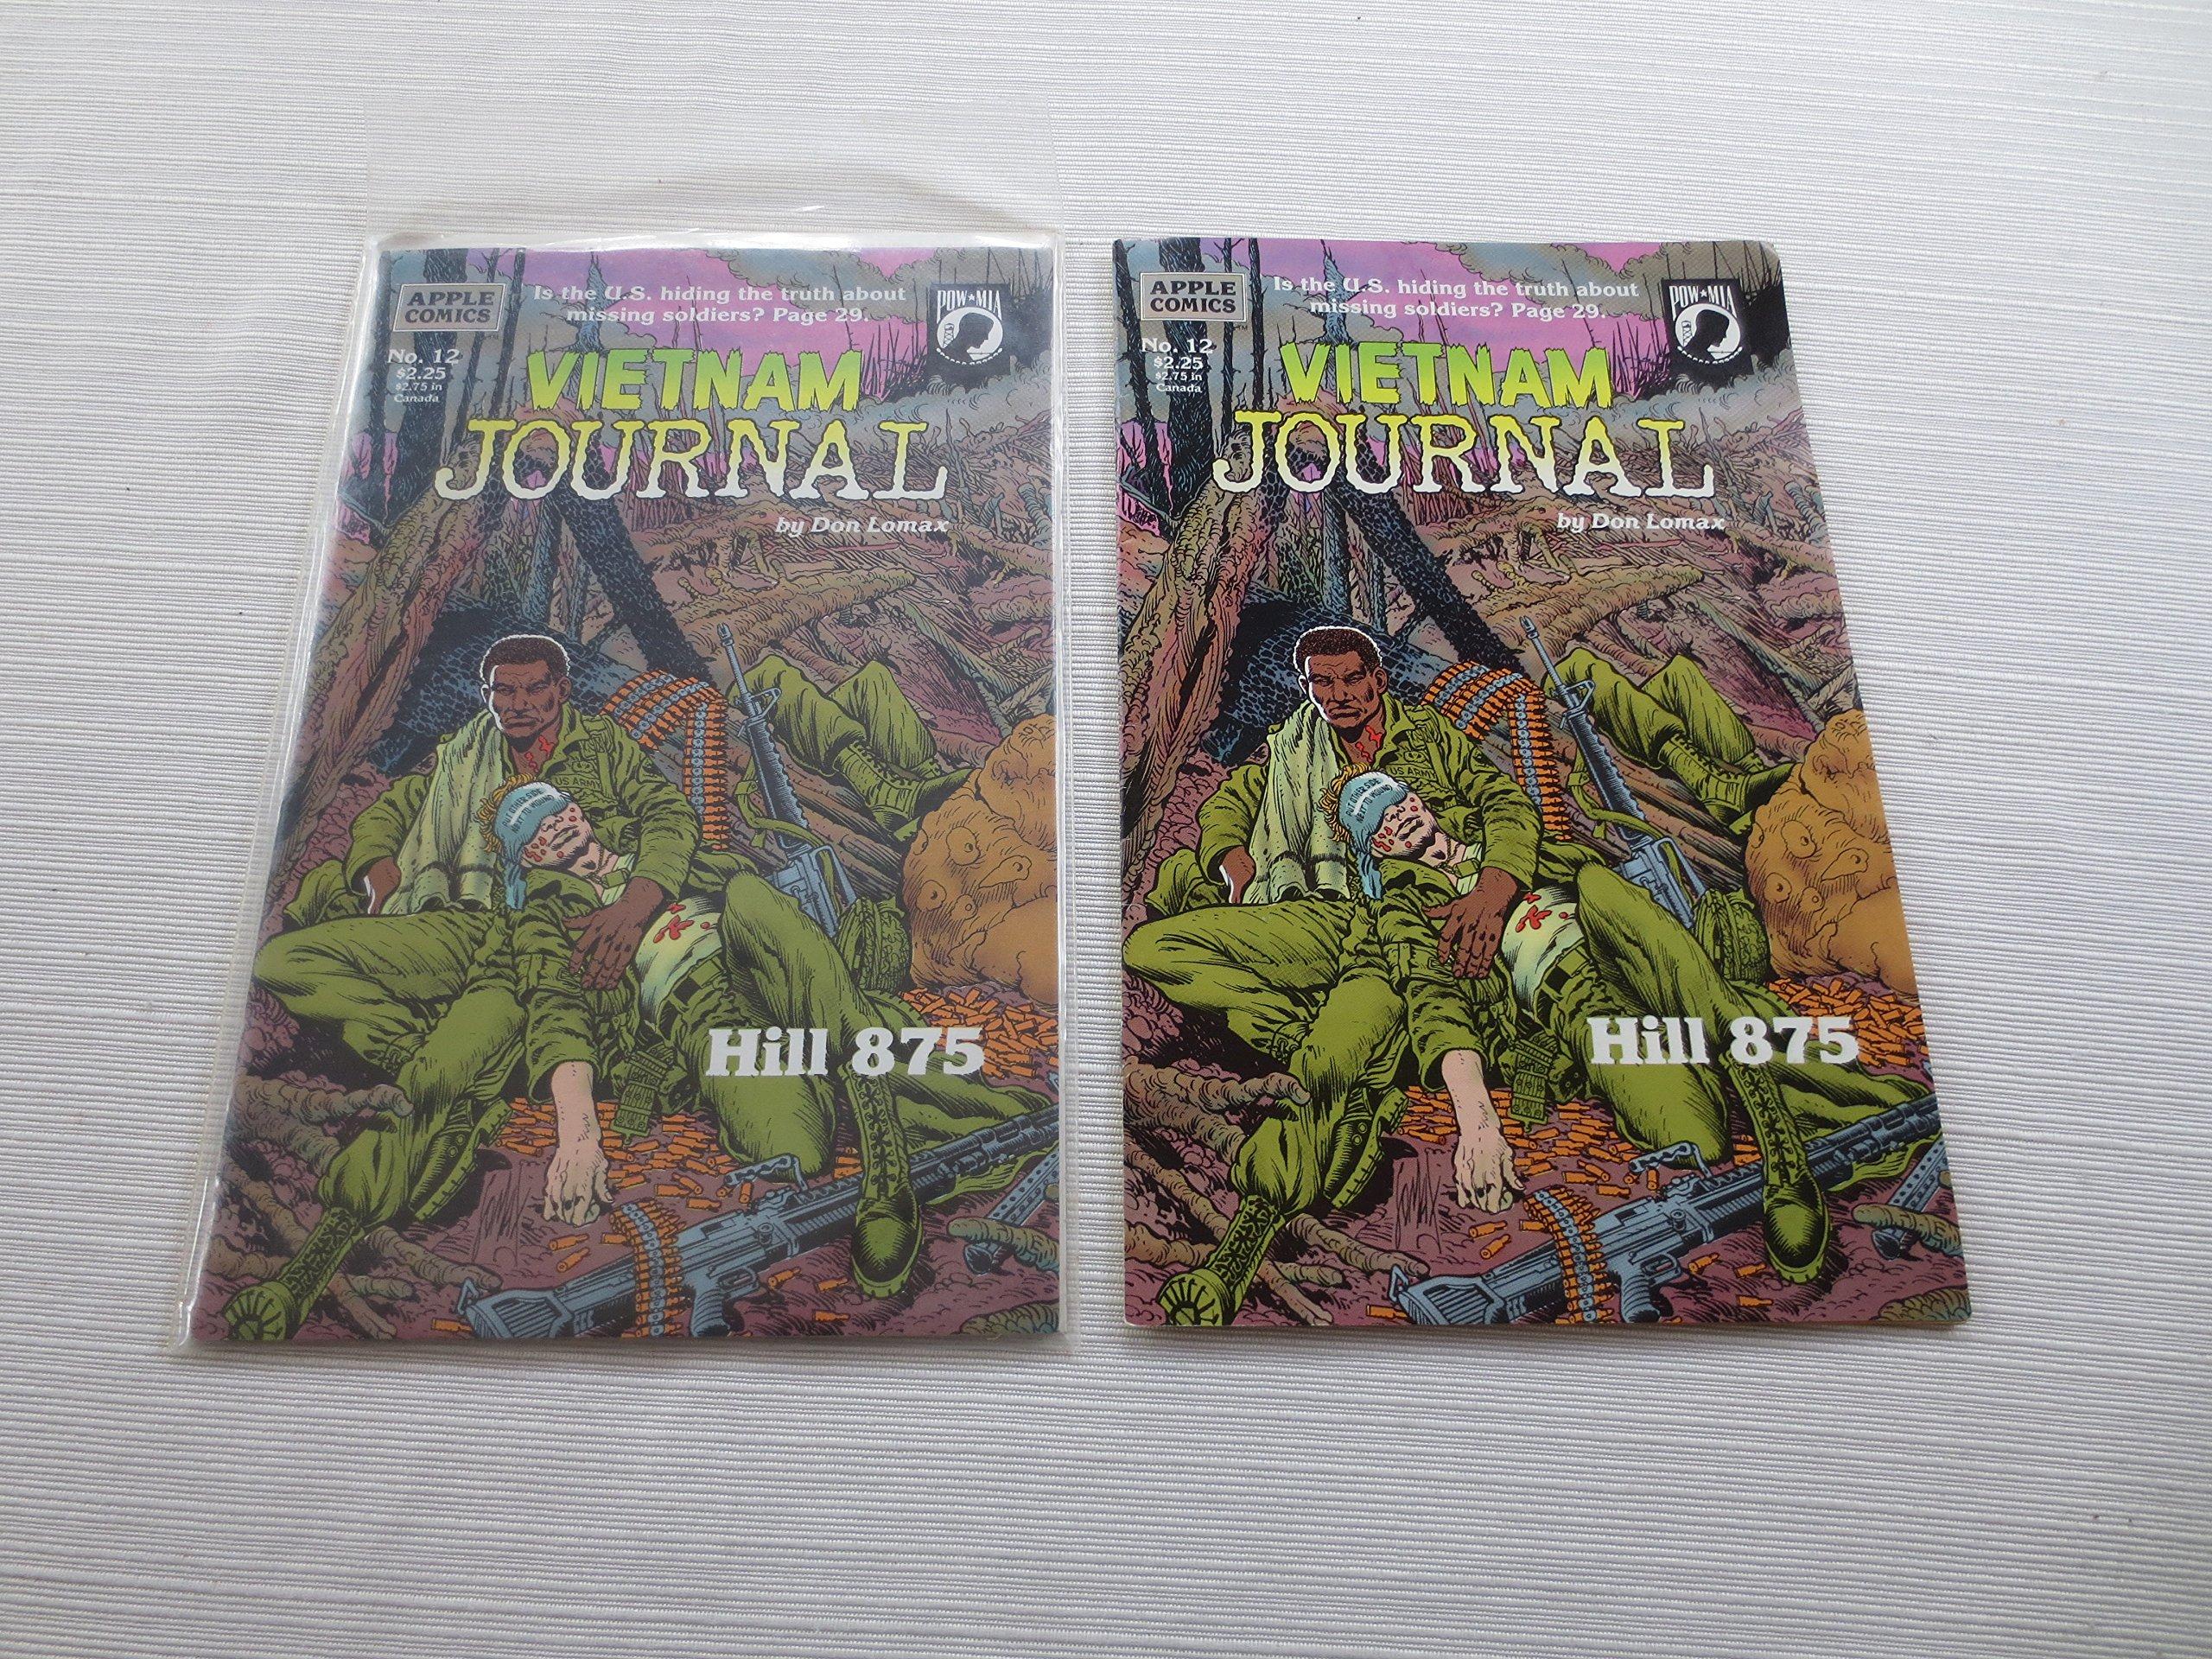 Vietnam Journal No  12: Hill 875: Don Lomax: Amazon com: Books